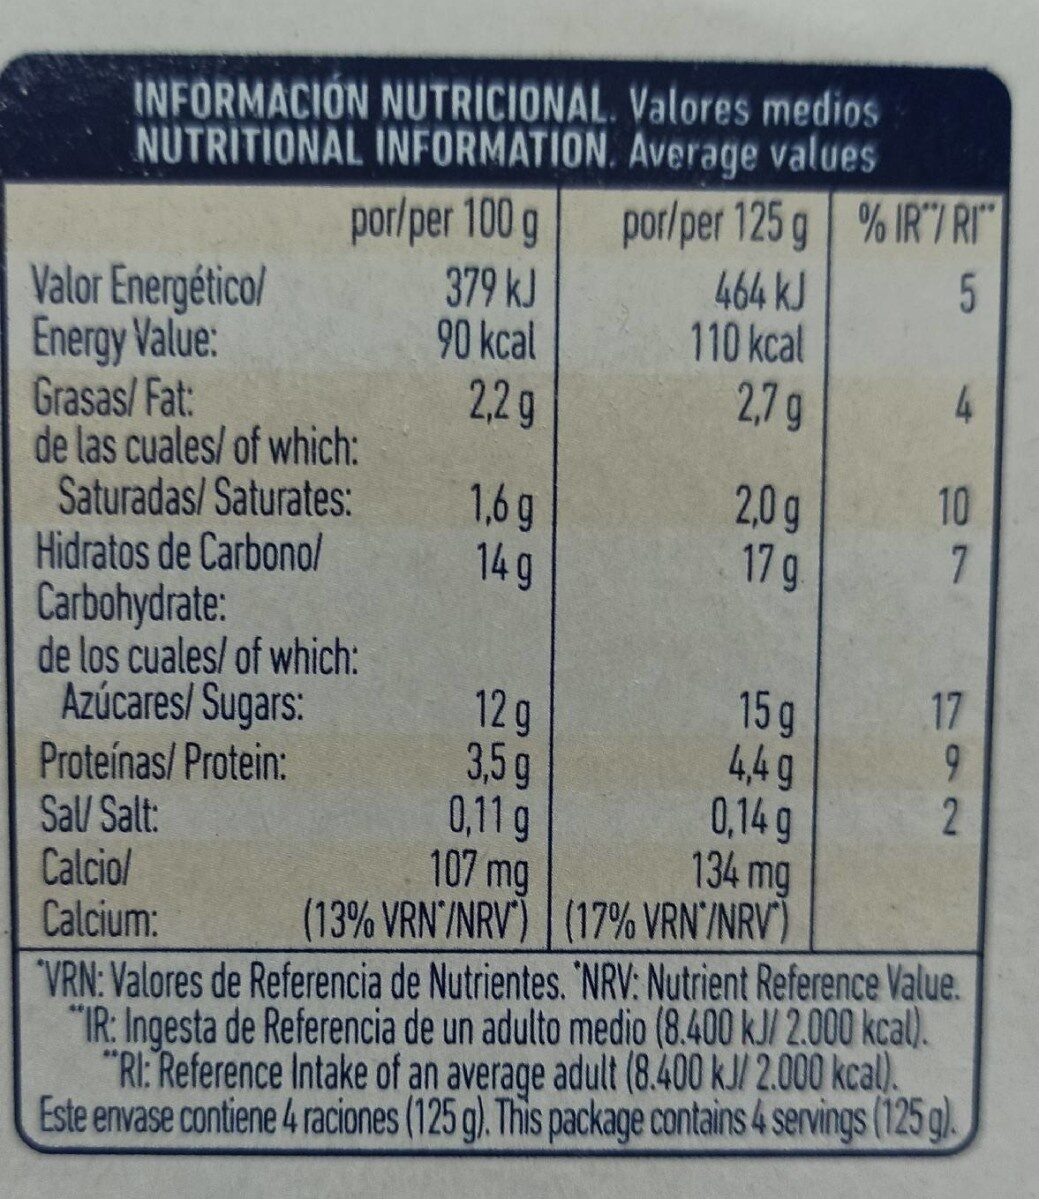 Yogur pasteurizado sabor fresa - Informations nutritionnelles - es